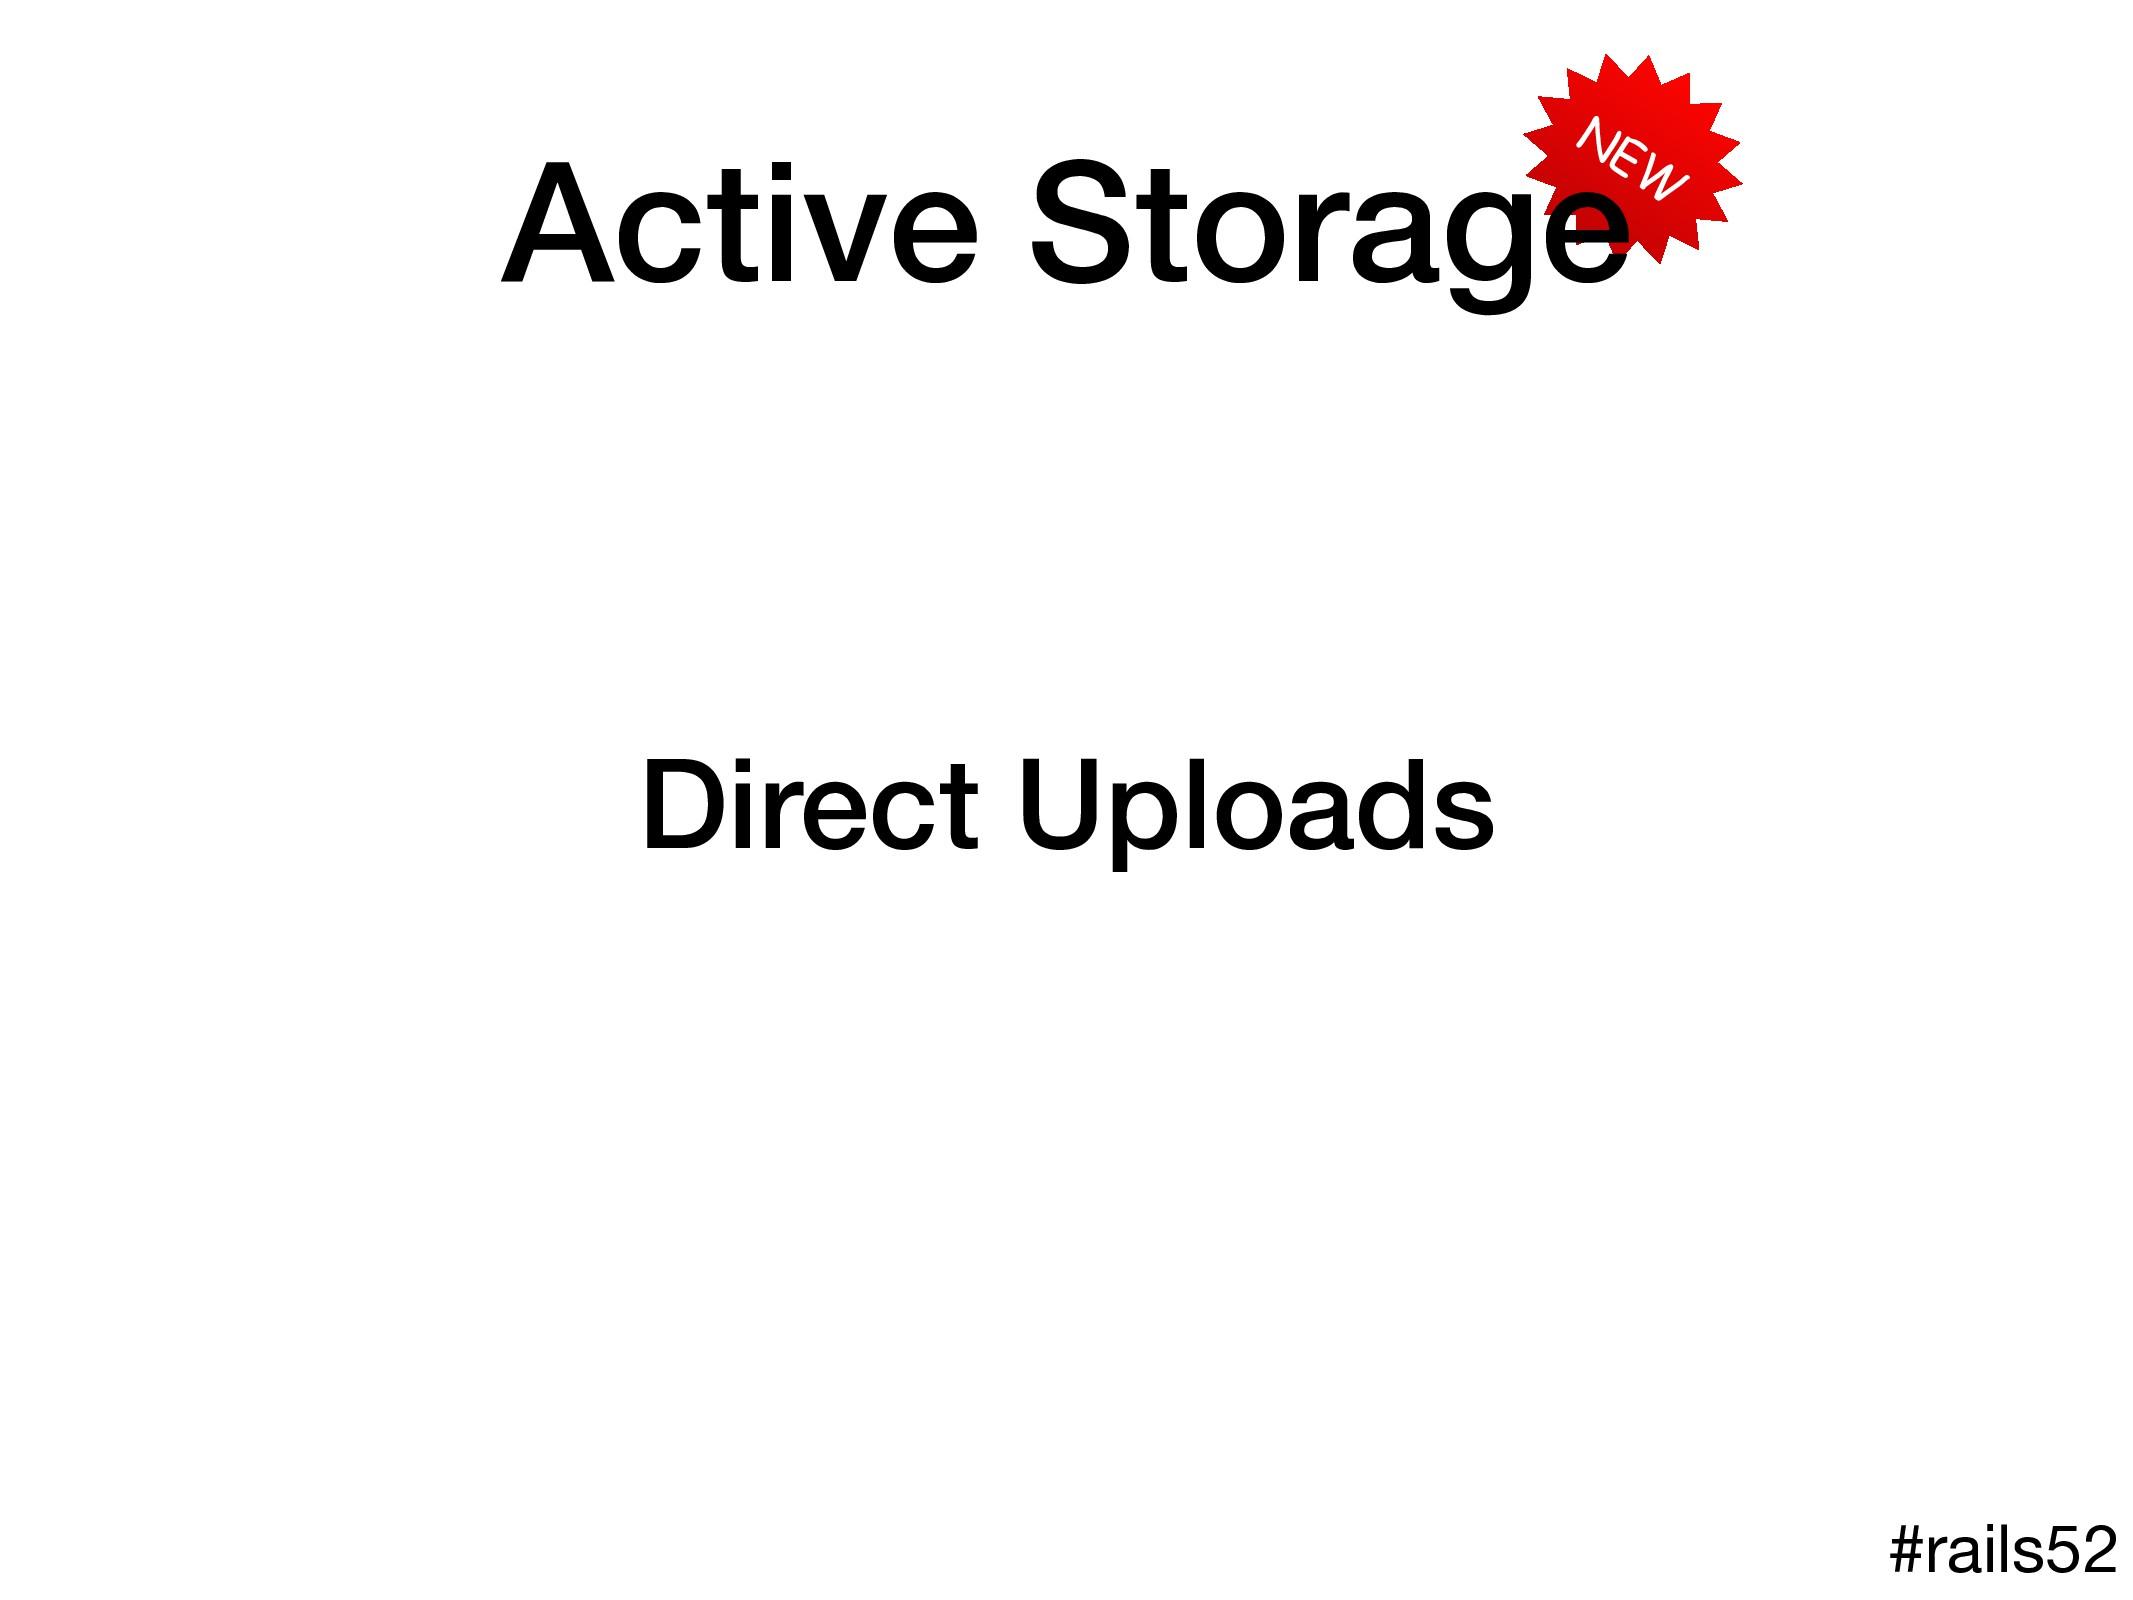 NEW Active Storage #rails52 Direct Uploads